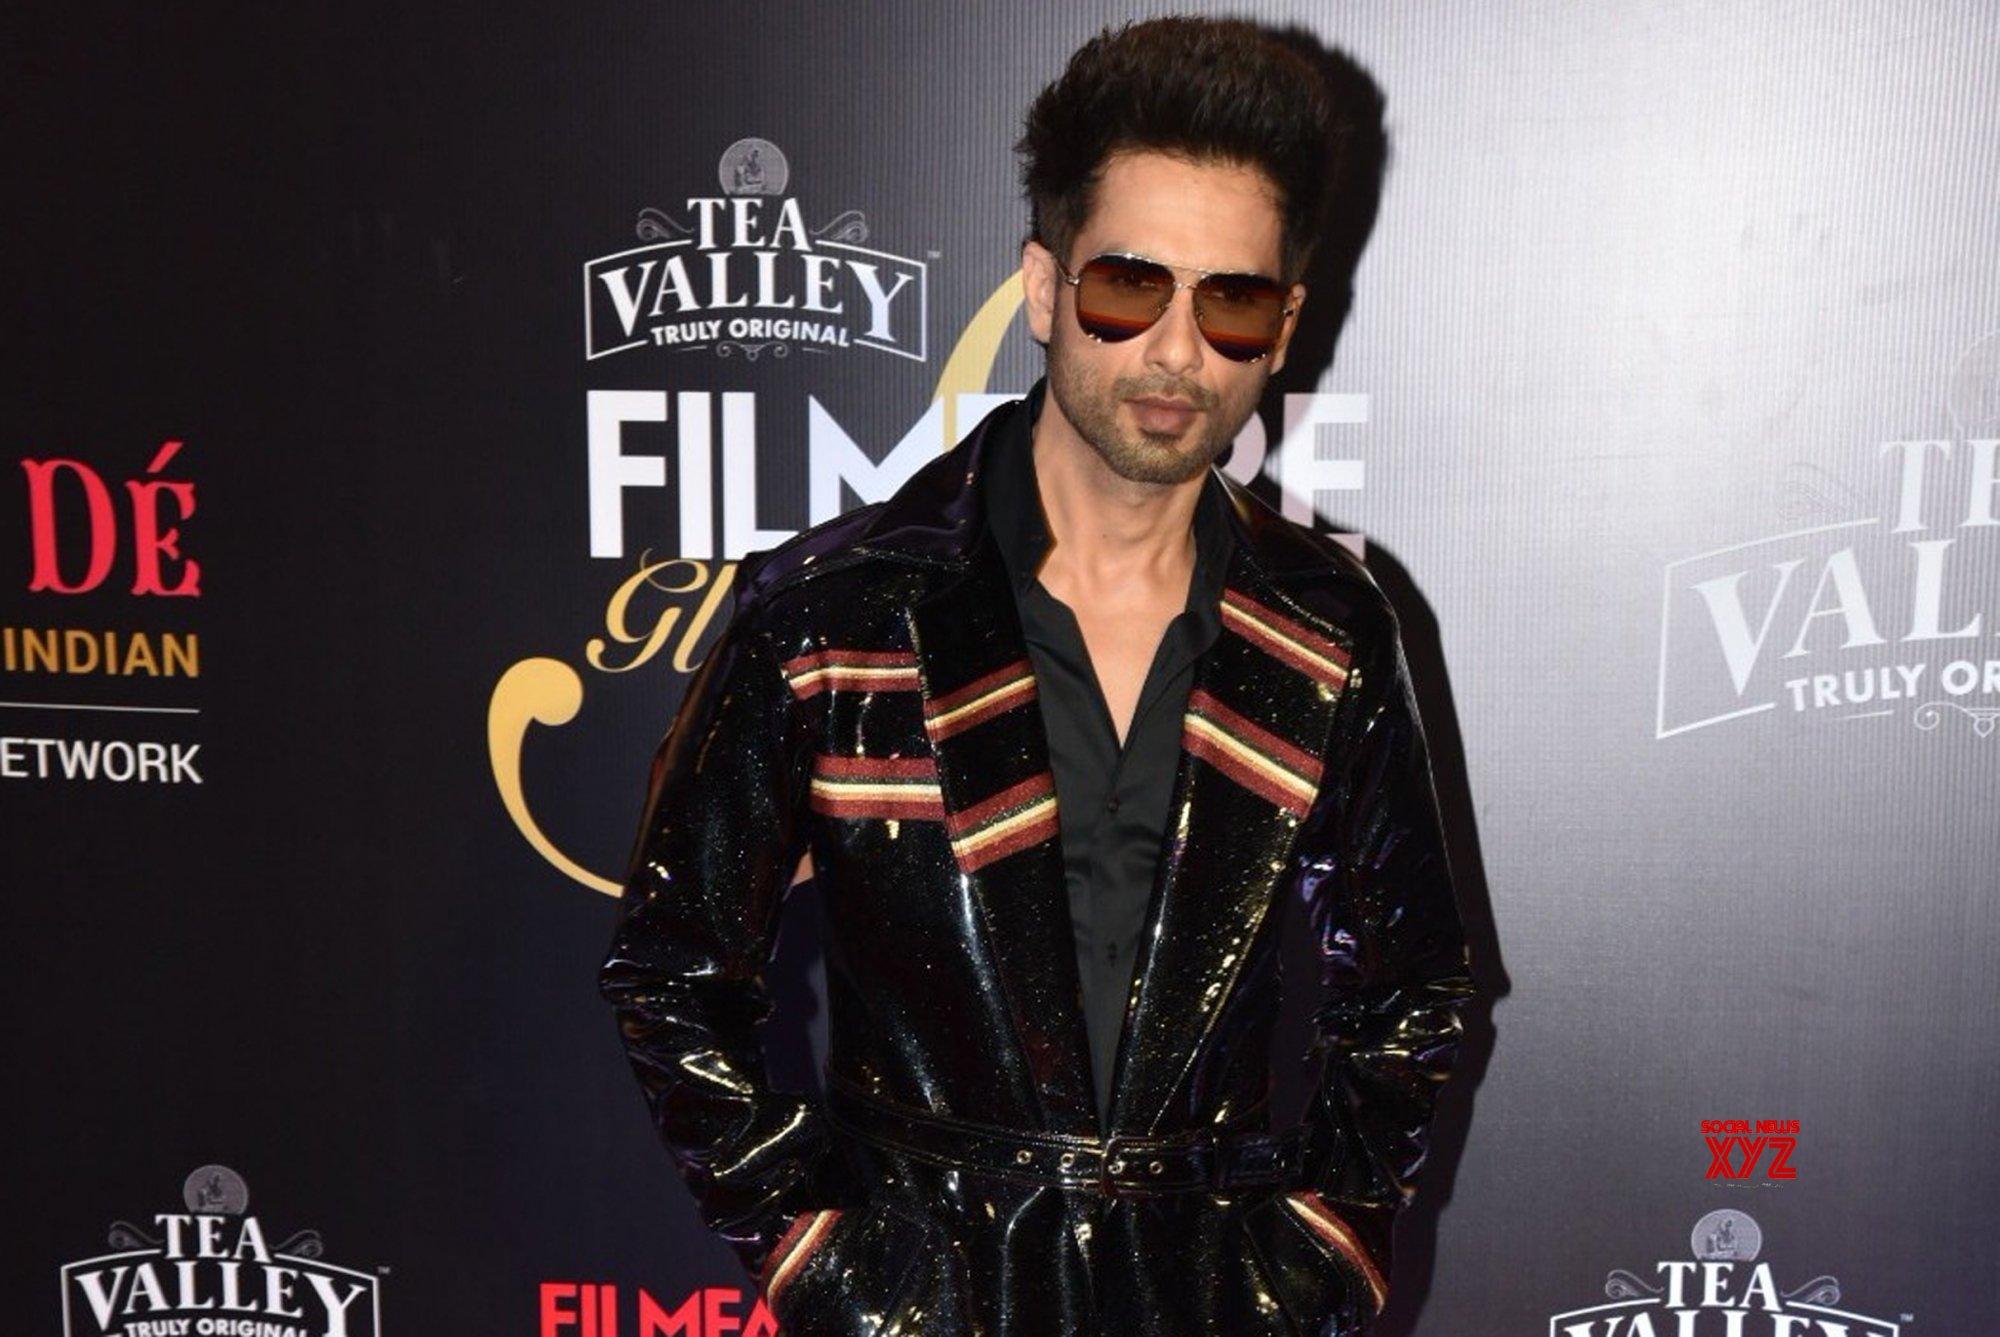 Mumbai: Filmfare Glamour And Style Awards 2019 - Shahid Kapoor #Gallery